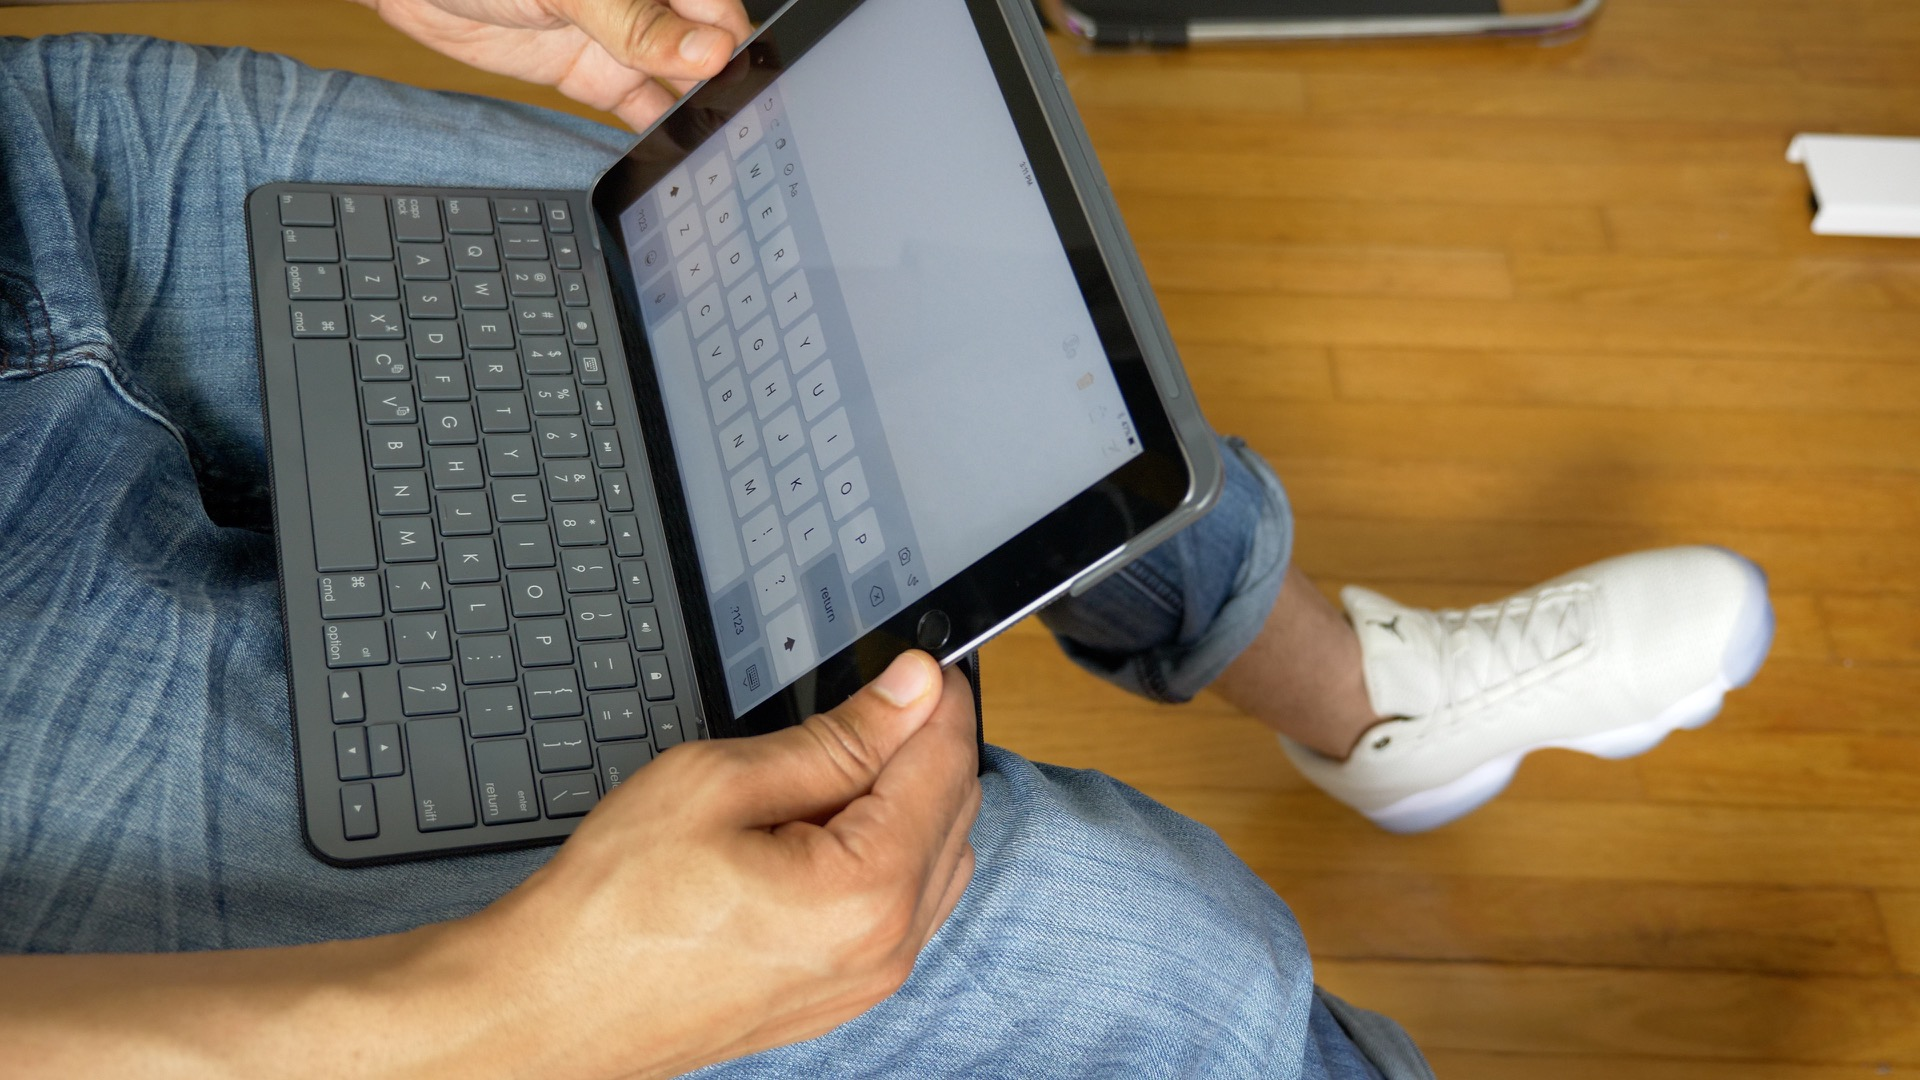 hot sale online f0fa7 0090c Hands-on: Logitech's Slim Folio keyboard case for 2017 iPad never ...